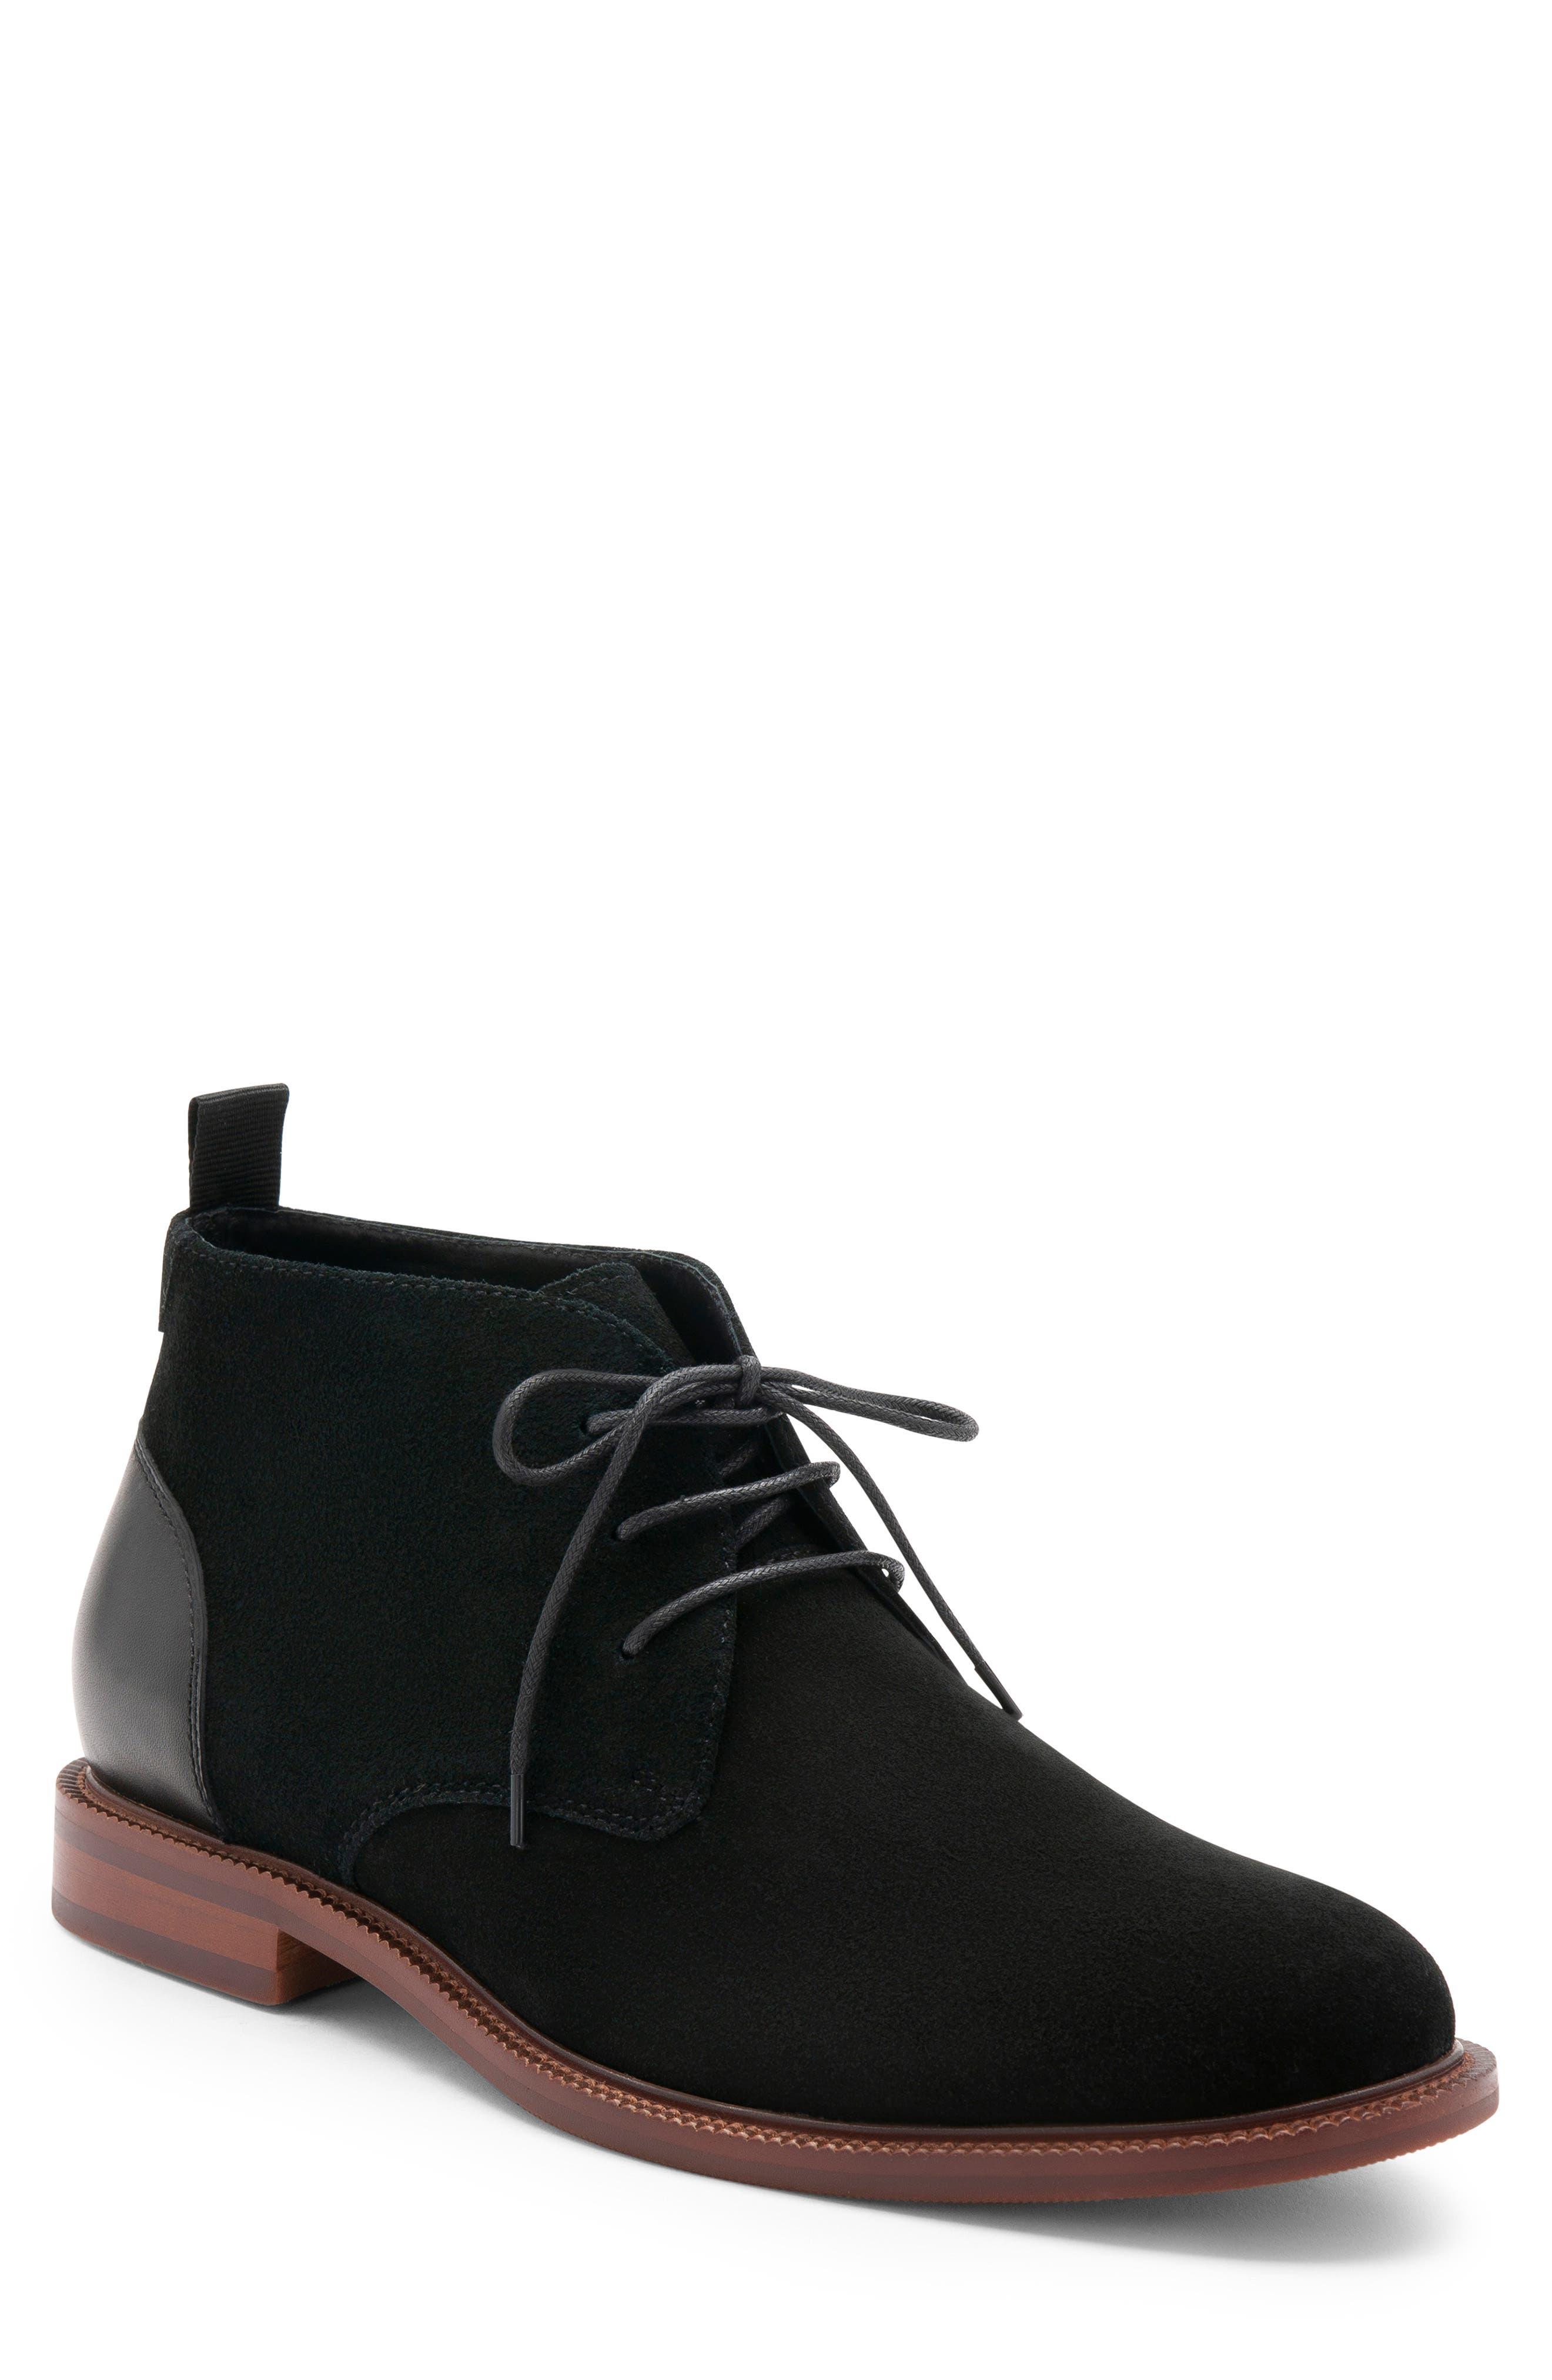 Keith Waterproof Chukka Boot,                         Main,                         color, BLACK SUEDE